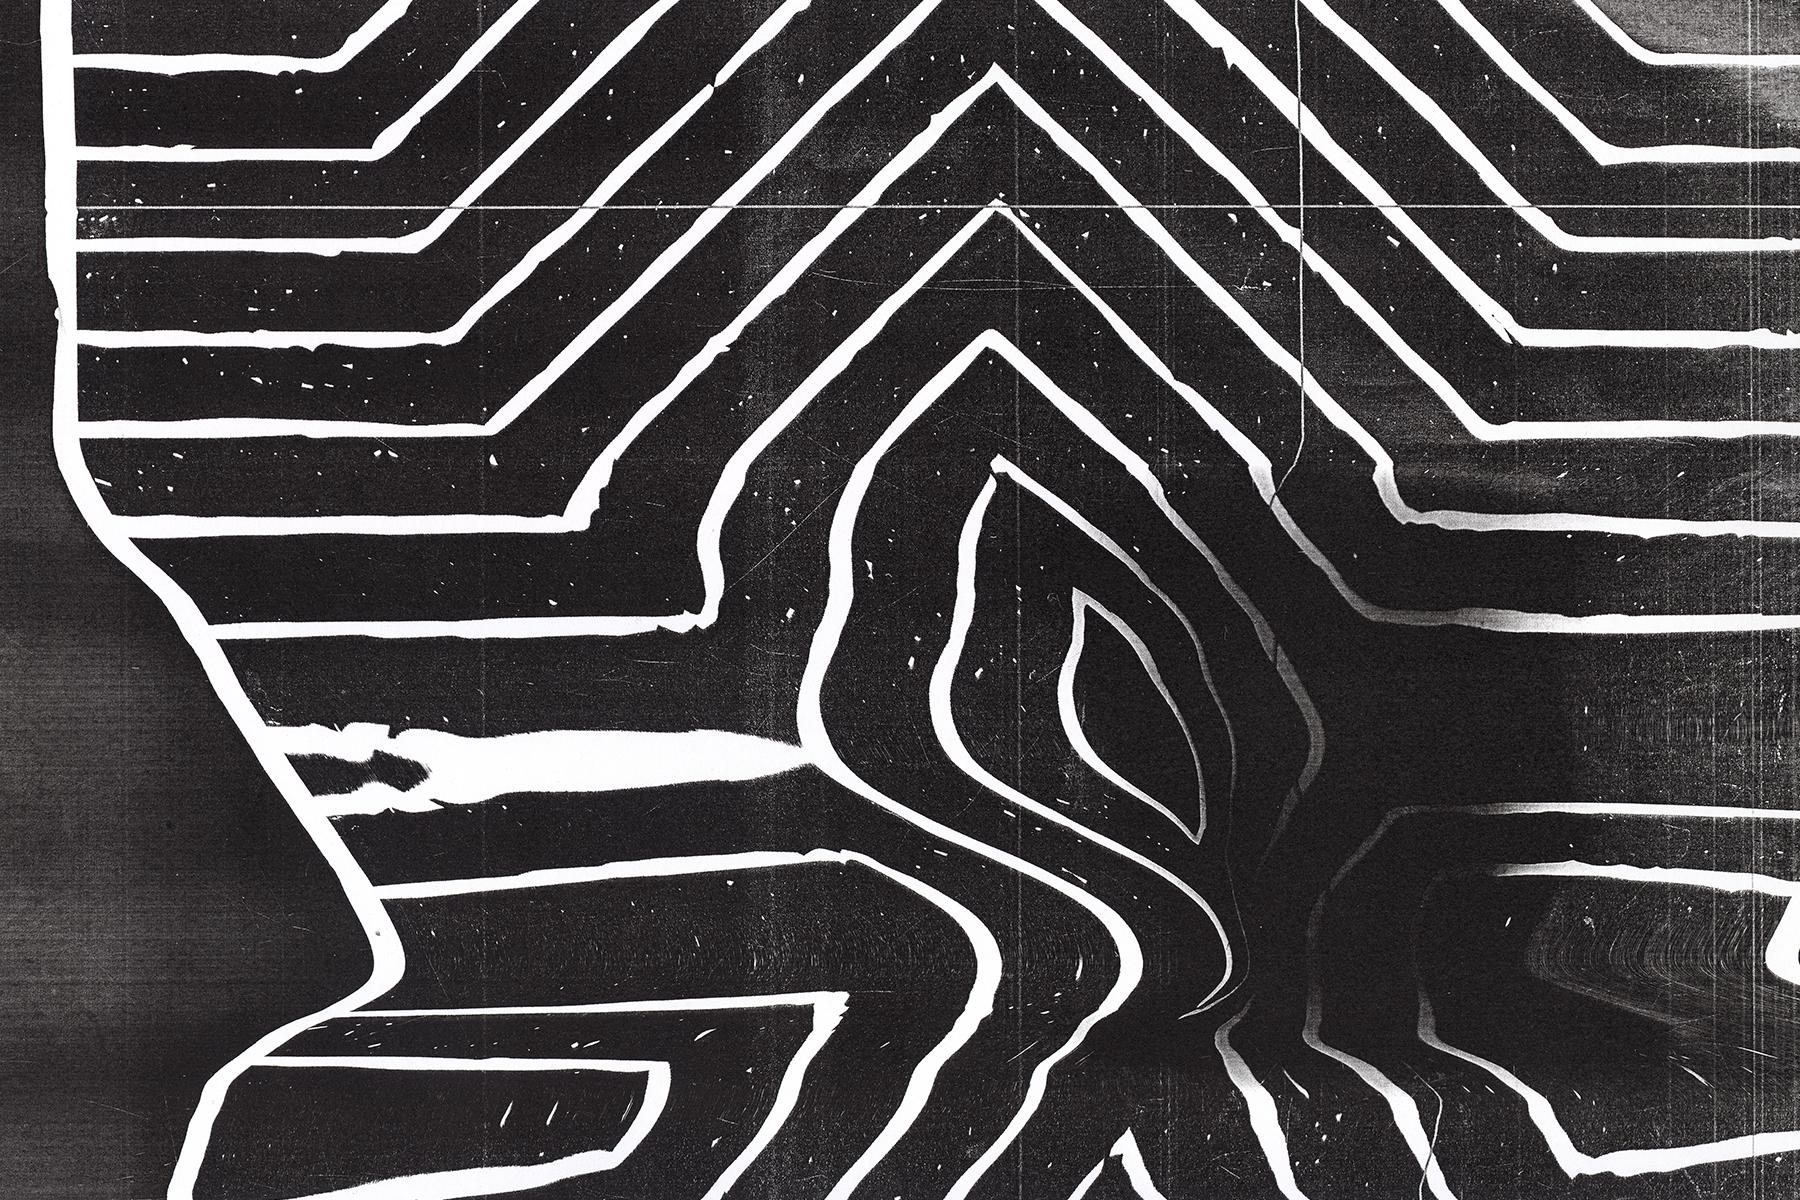 16 Photocopied Stripes example image 10